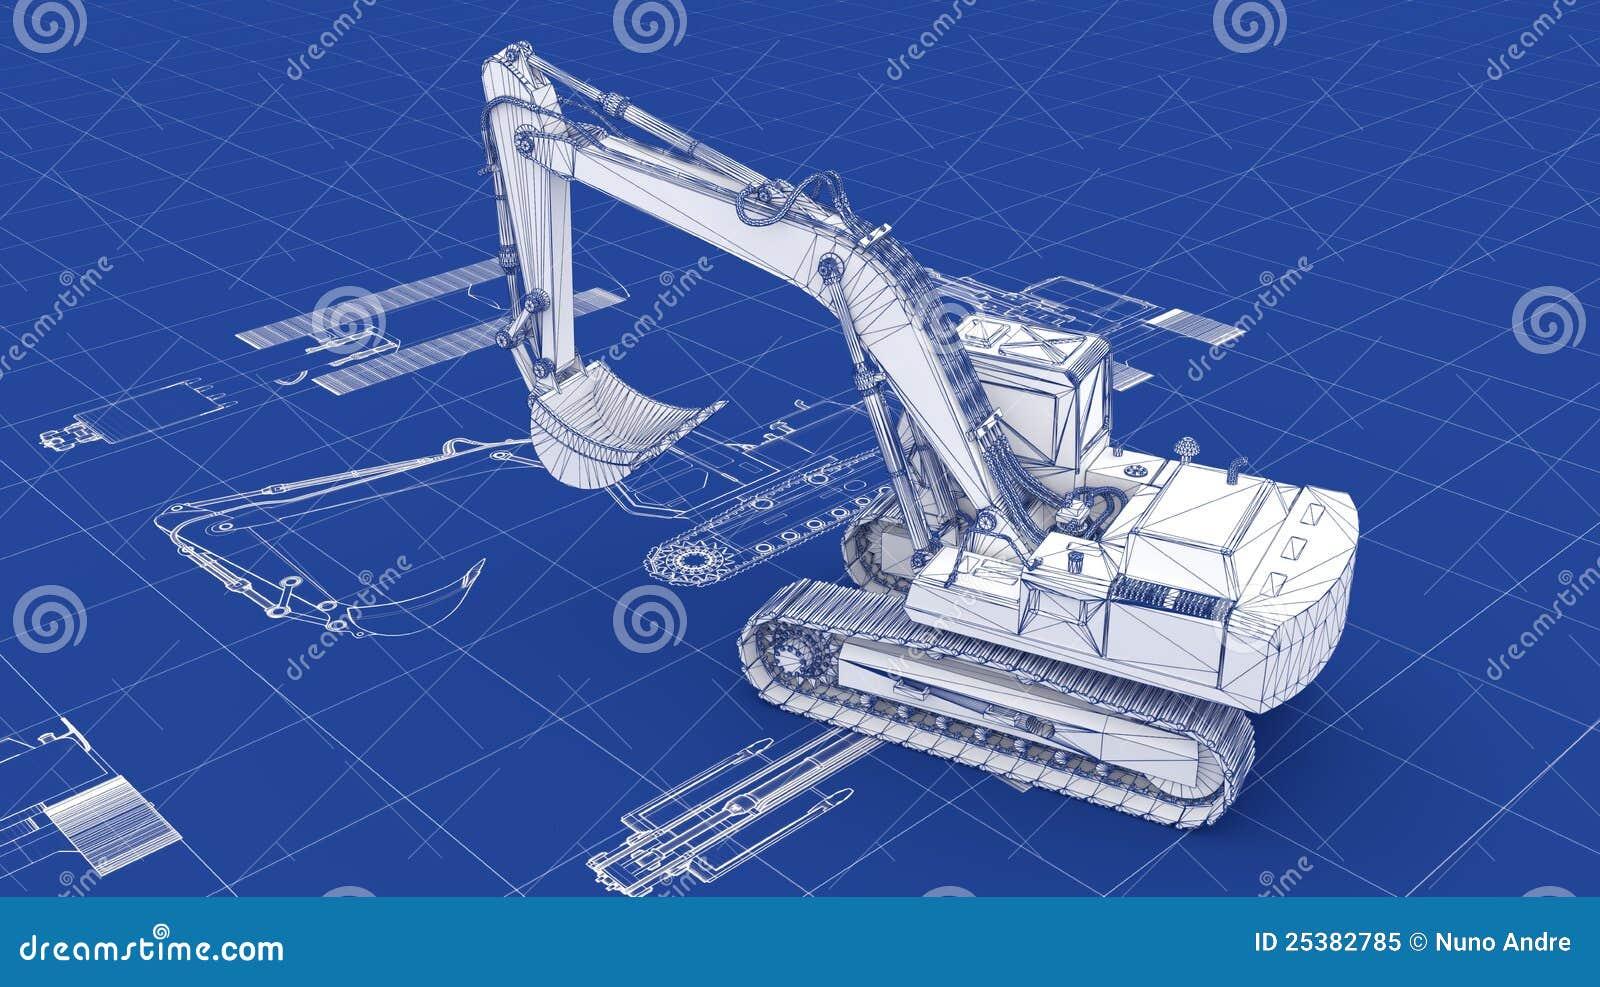 Excavator Blueprint Royalty Free Stock Photo Image 25382785